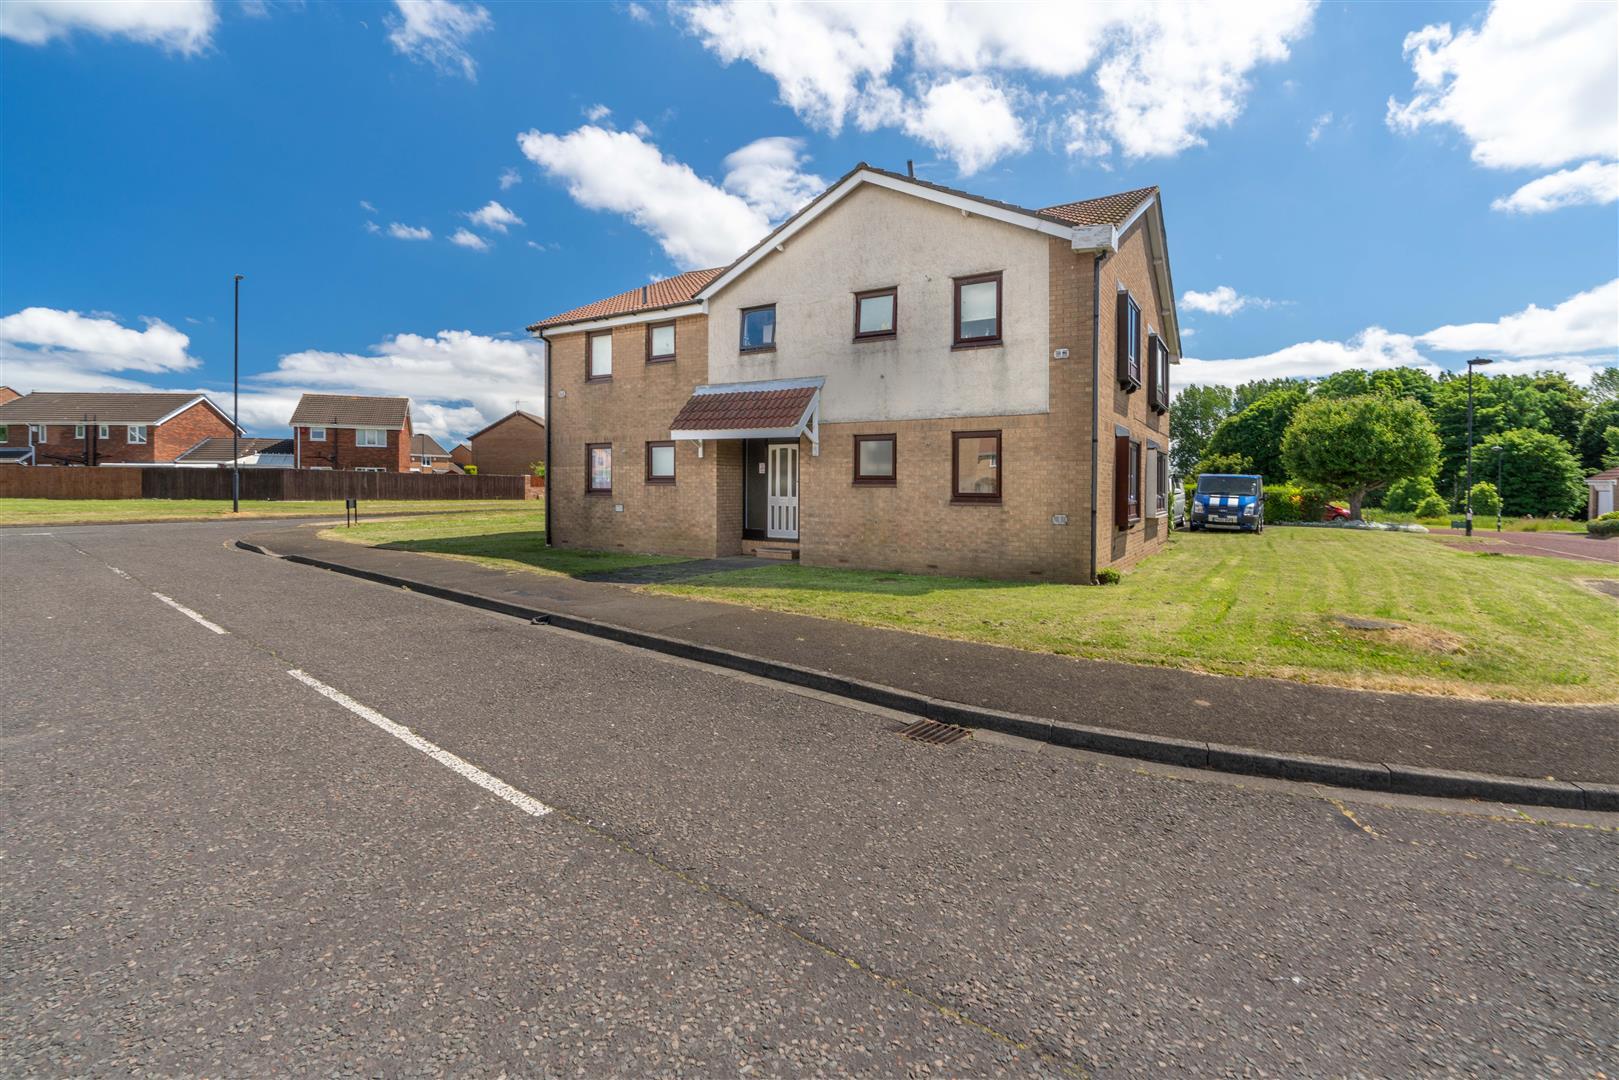 1 bed studio flat to rent in Rosedale, Wallsend, NE28